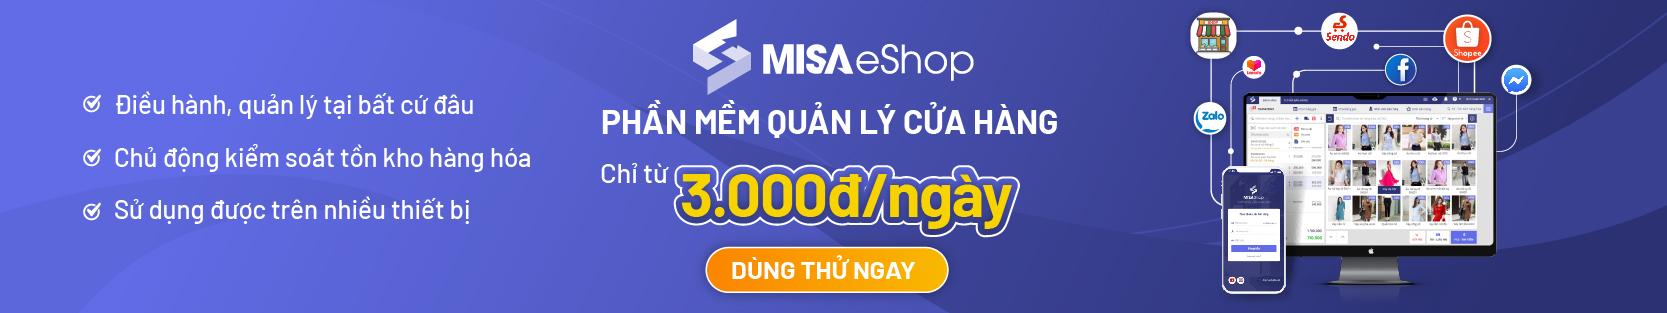 MISA eShop